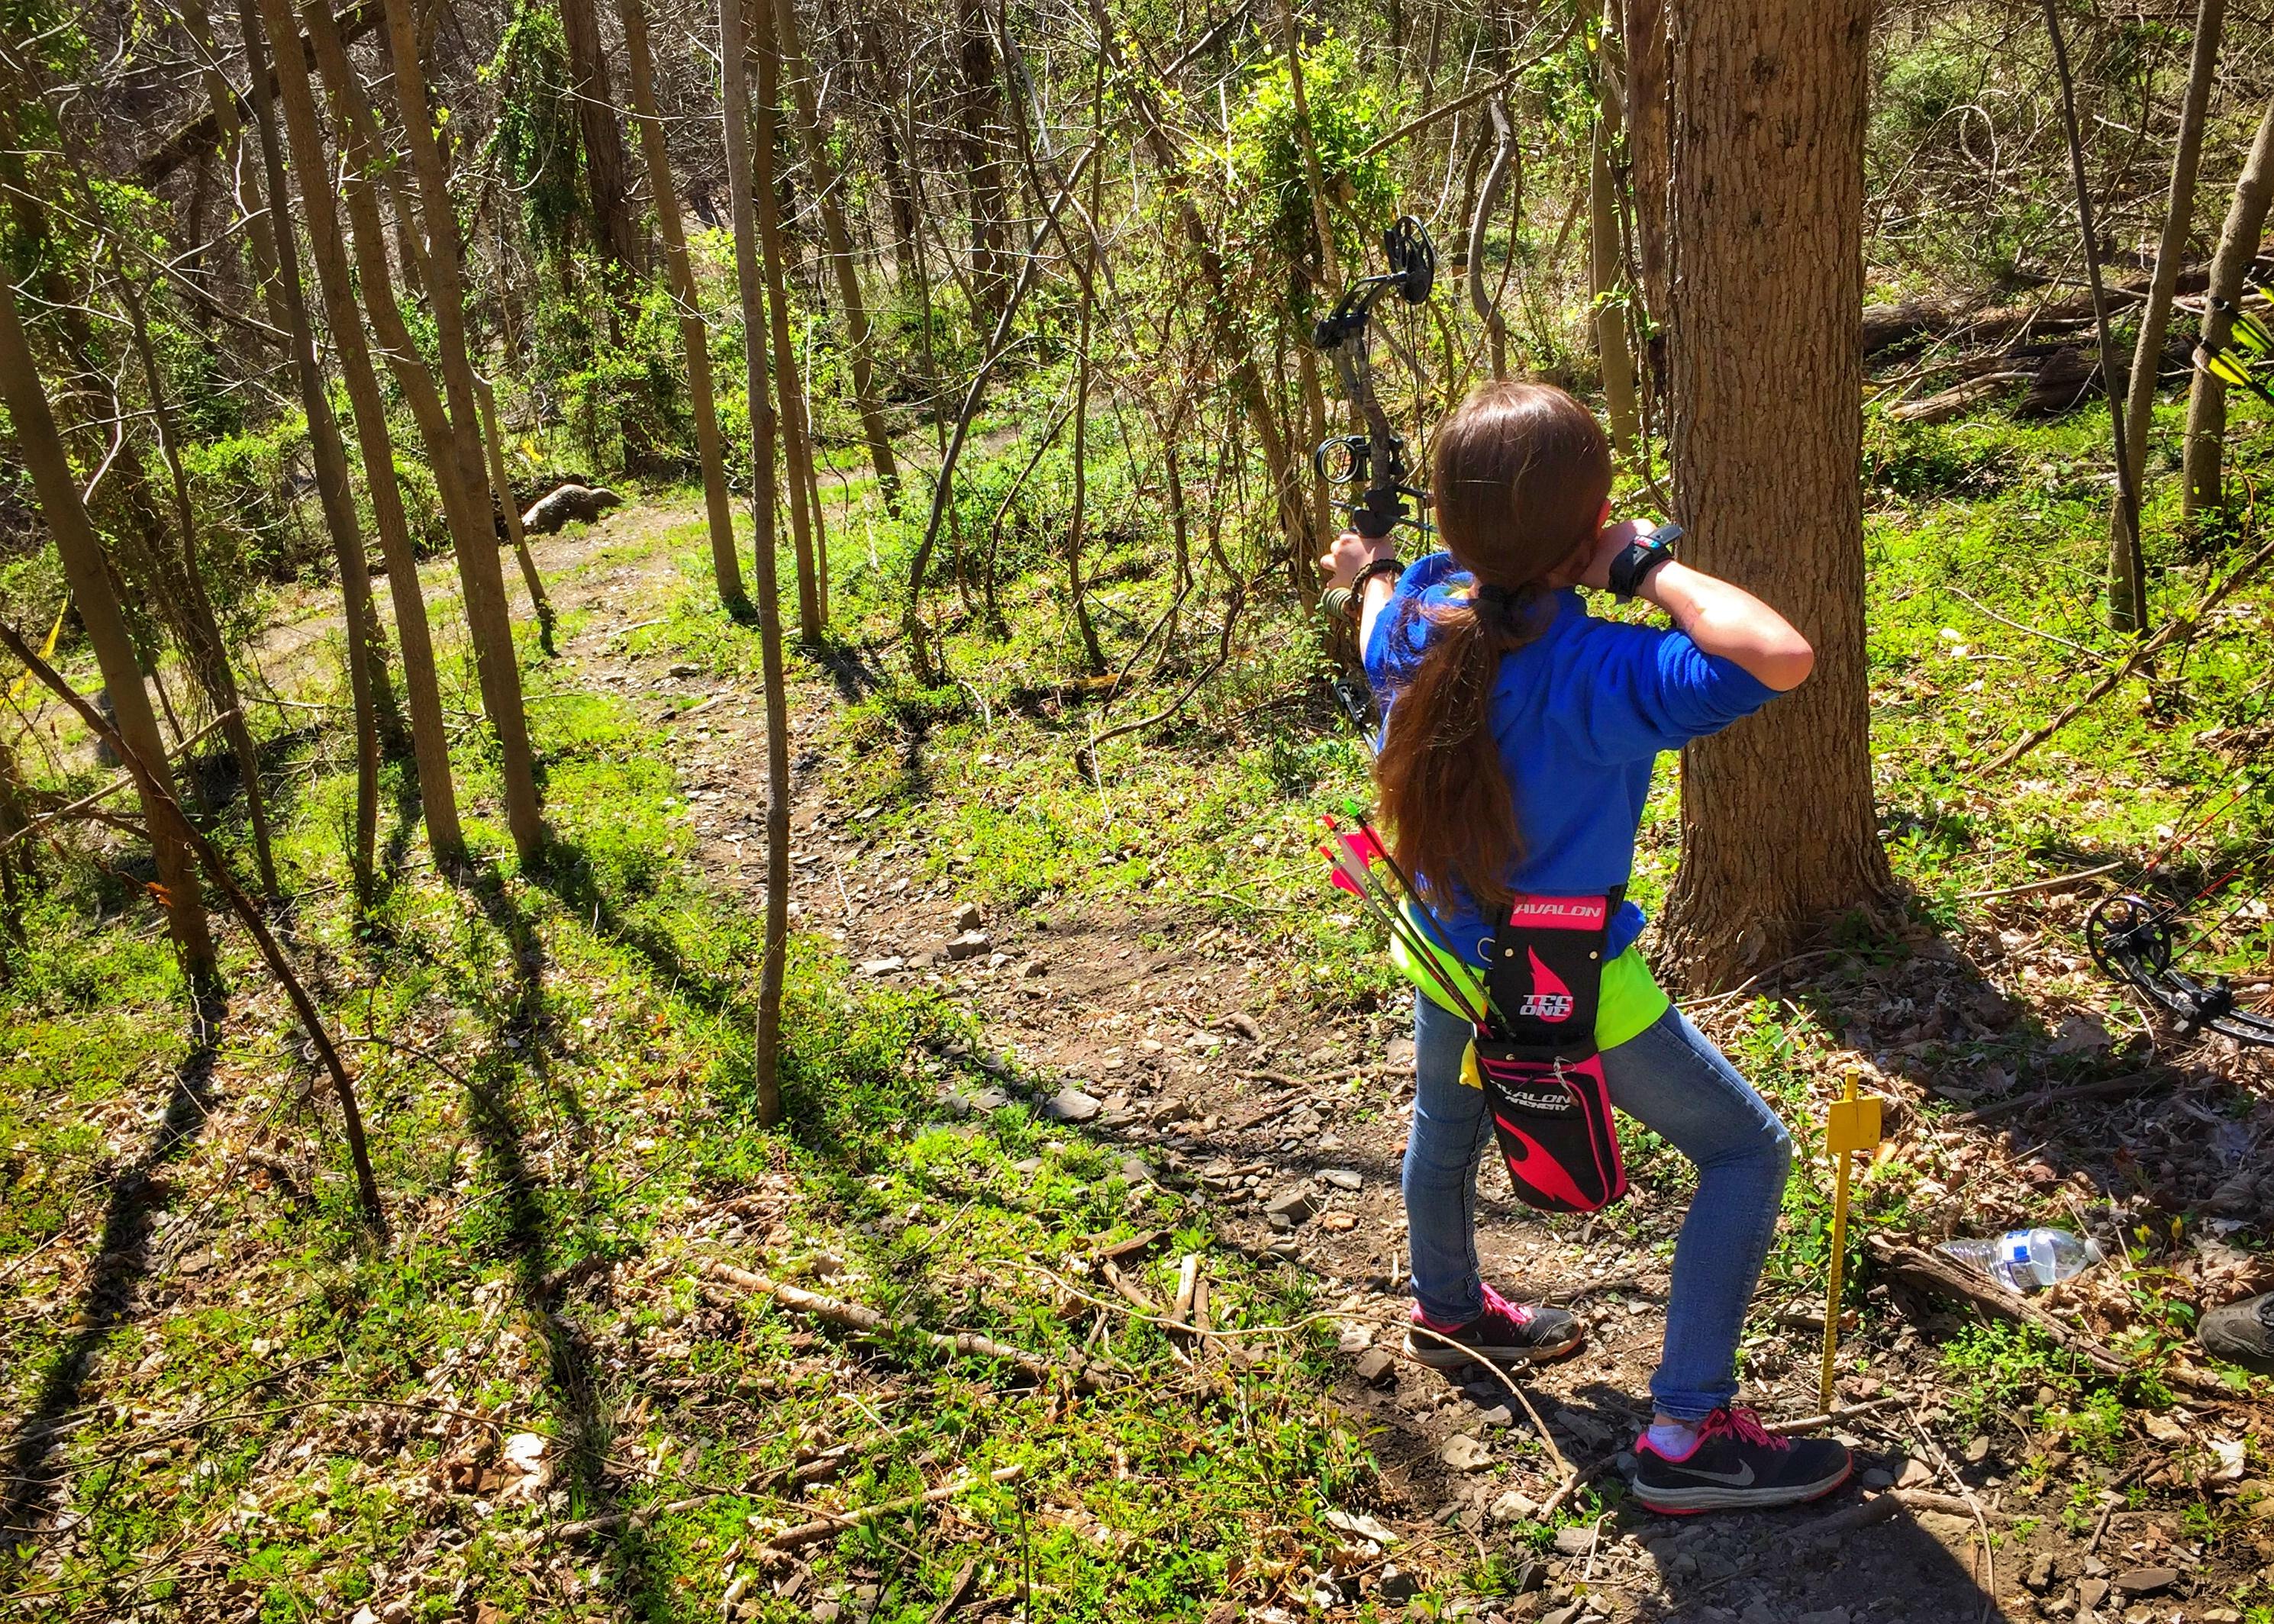 2016 Stowe Archers Triple Threat Challenge - Lexy